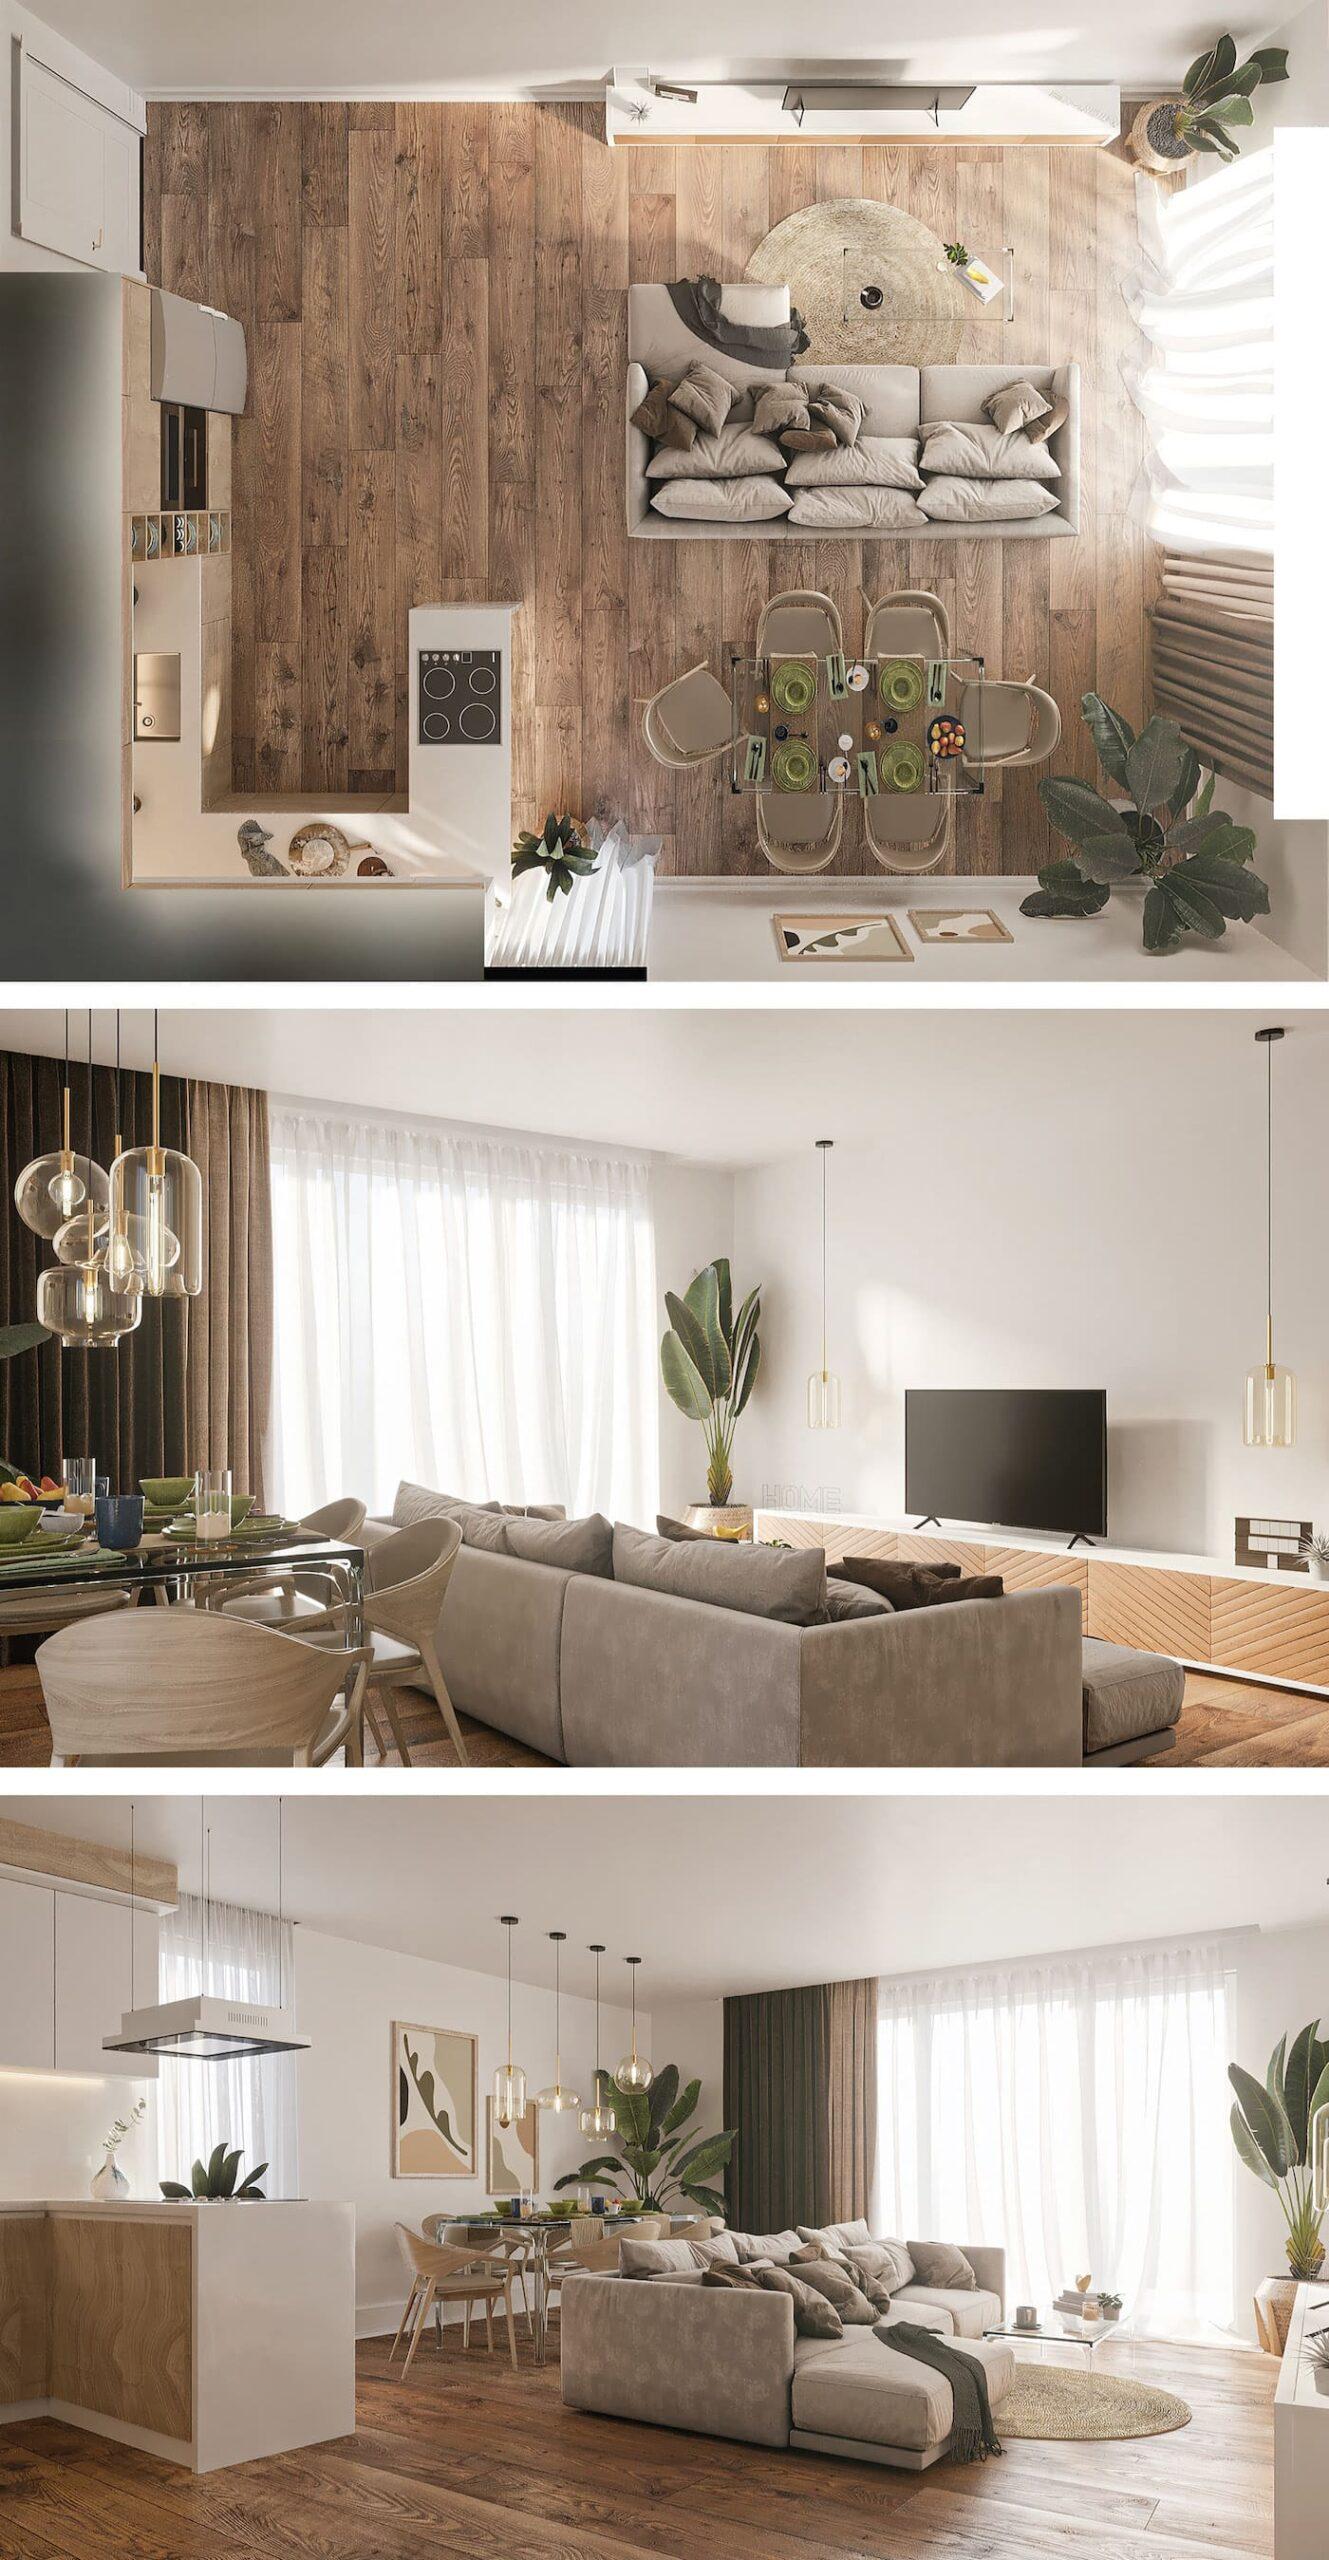 дизайн однокомнатной квартиры фото 62